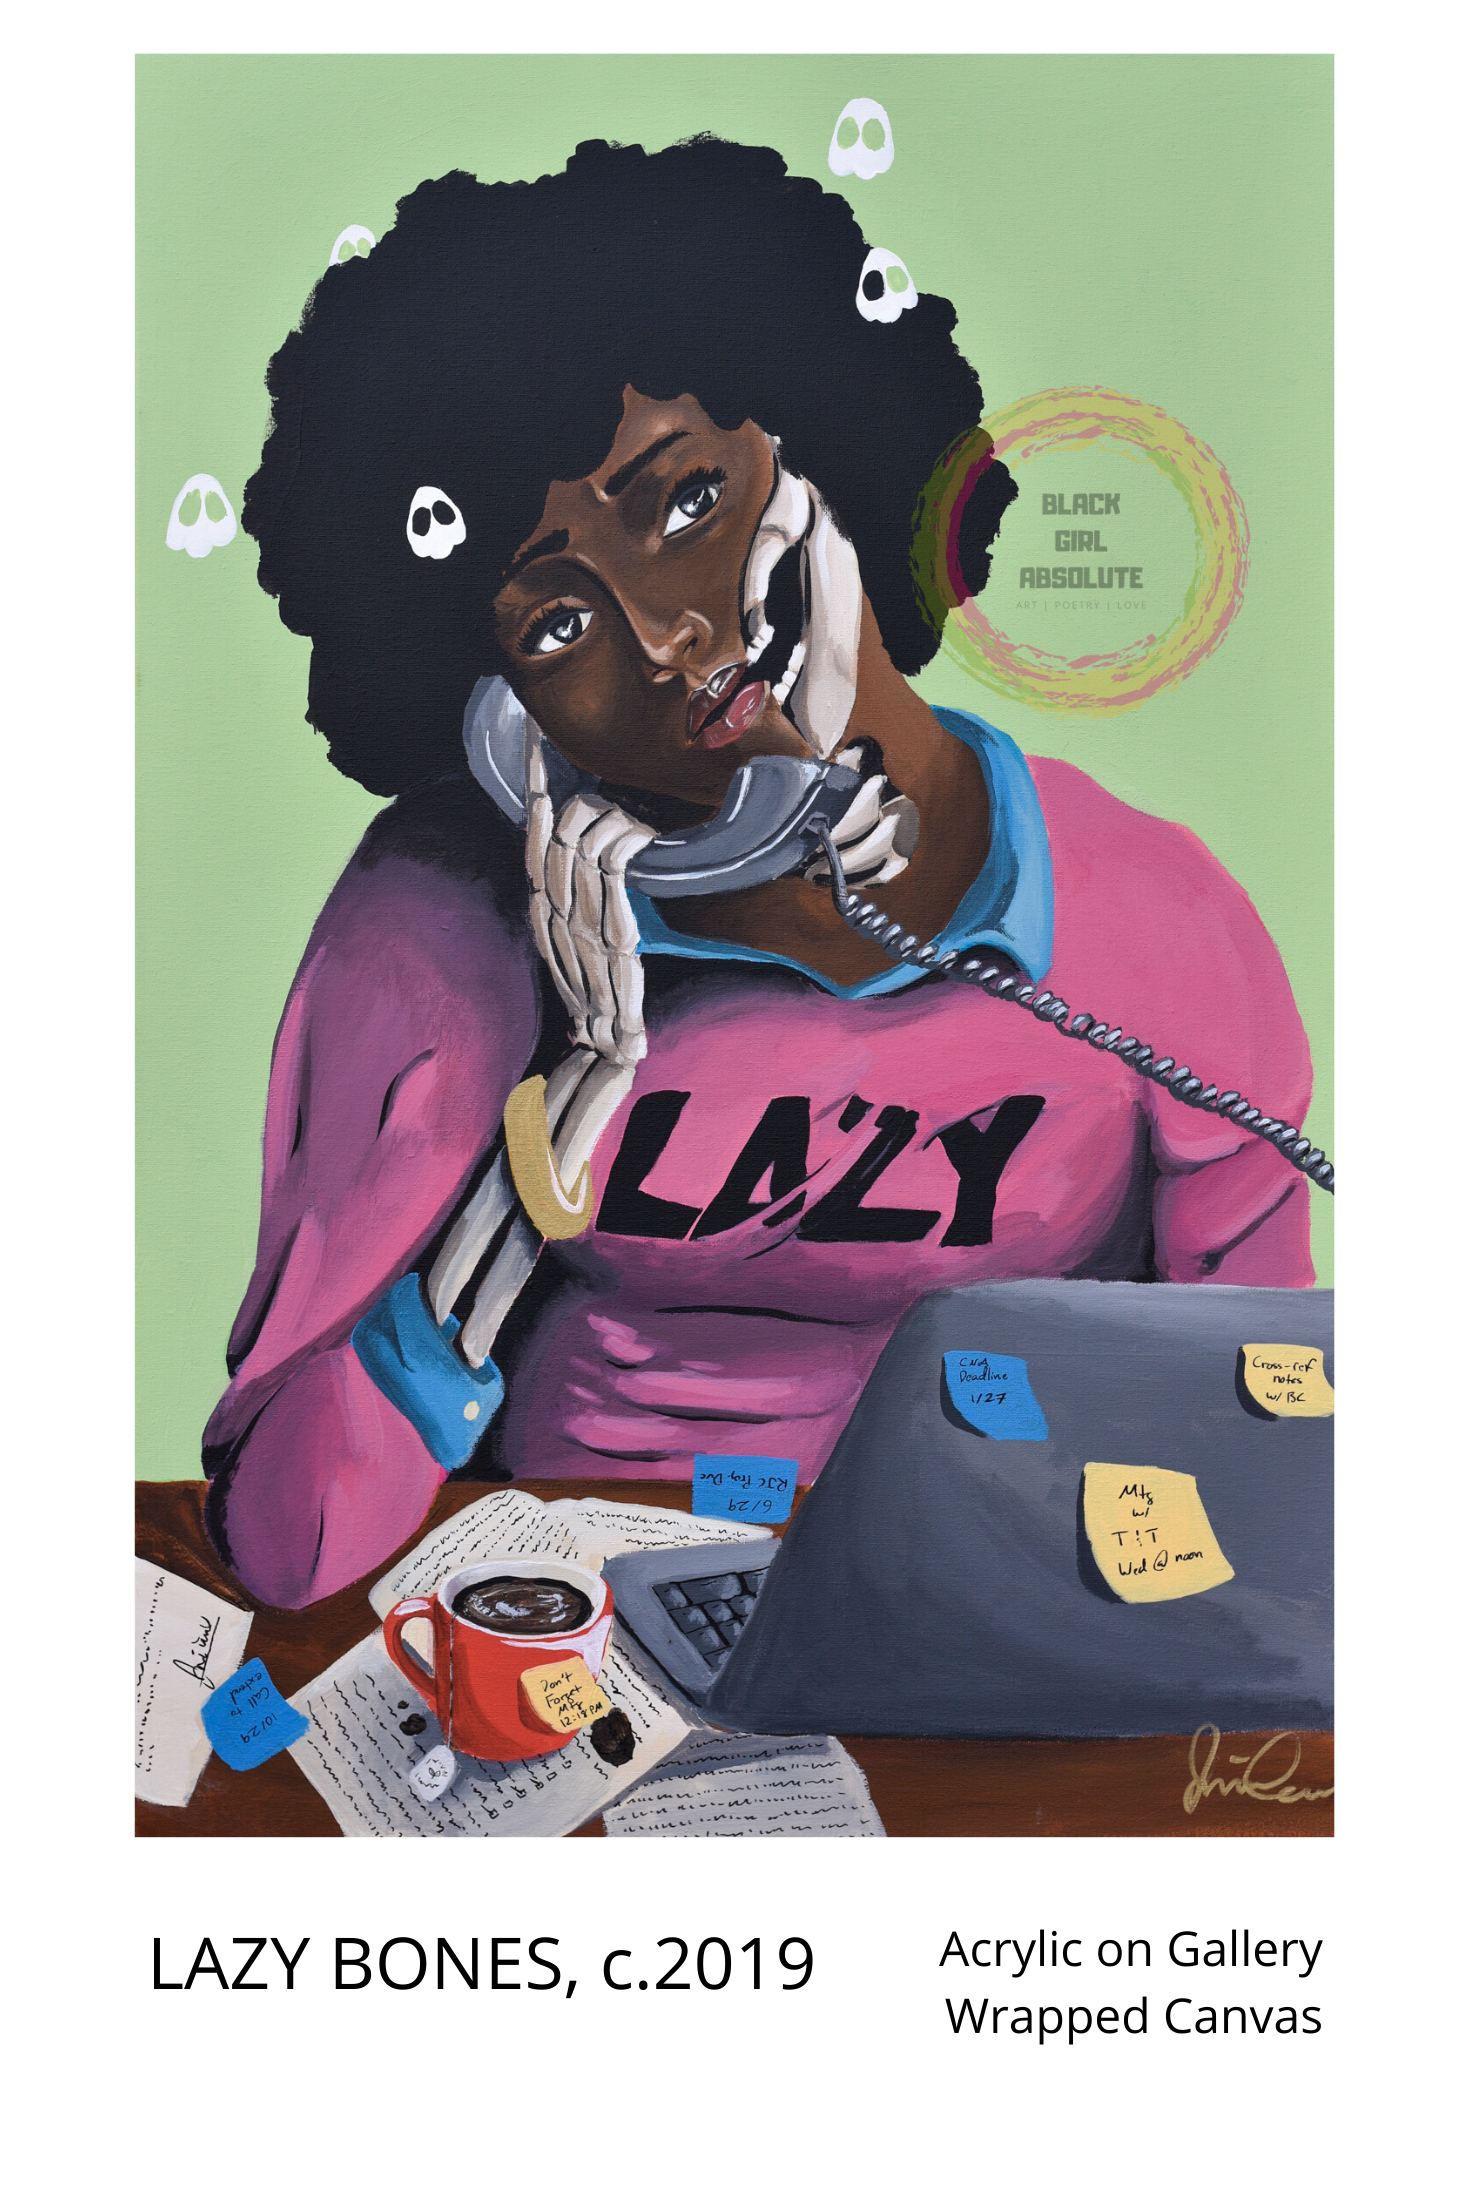 LAZY BONES, c.2019